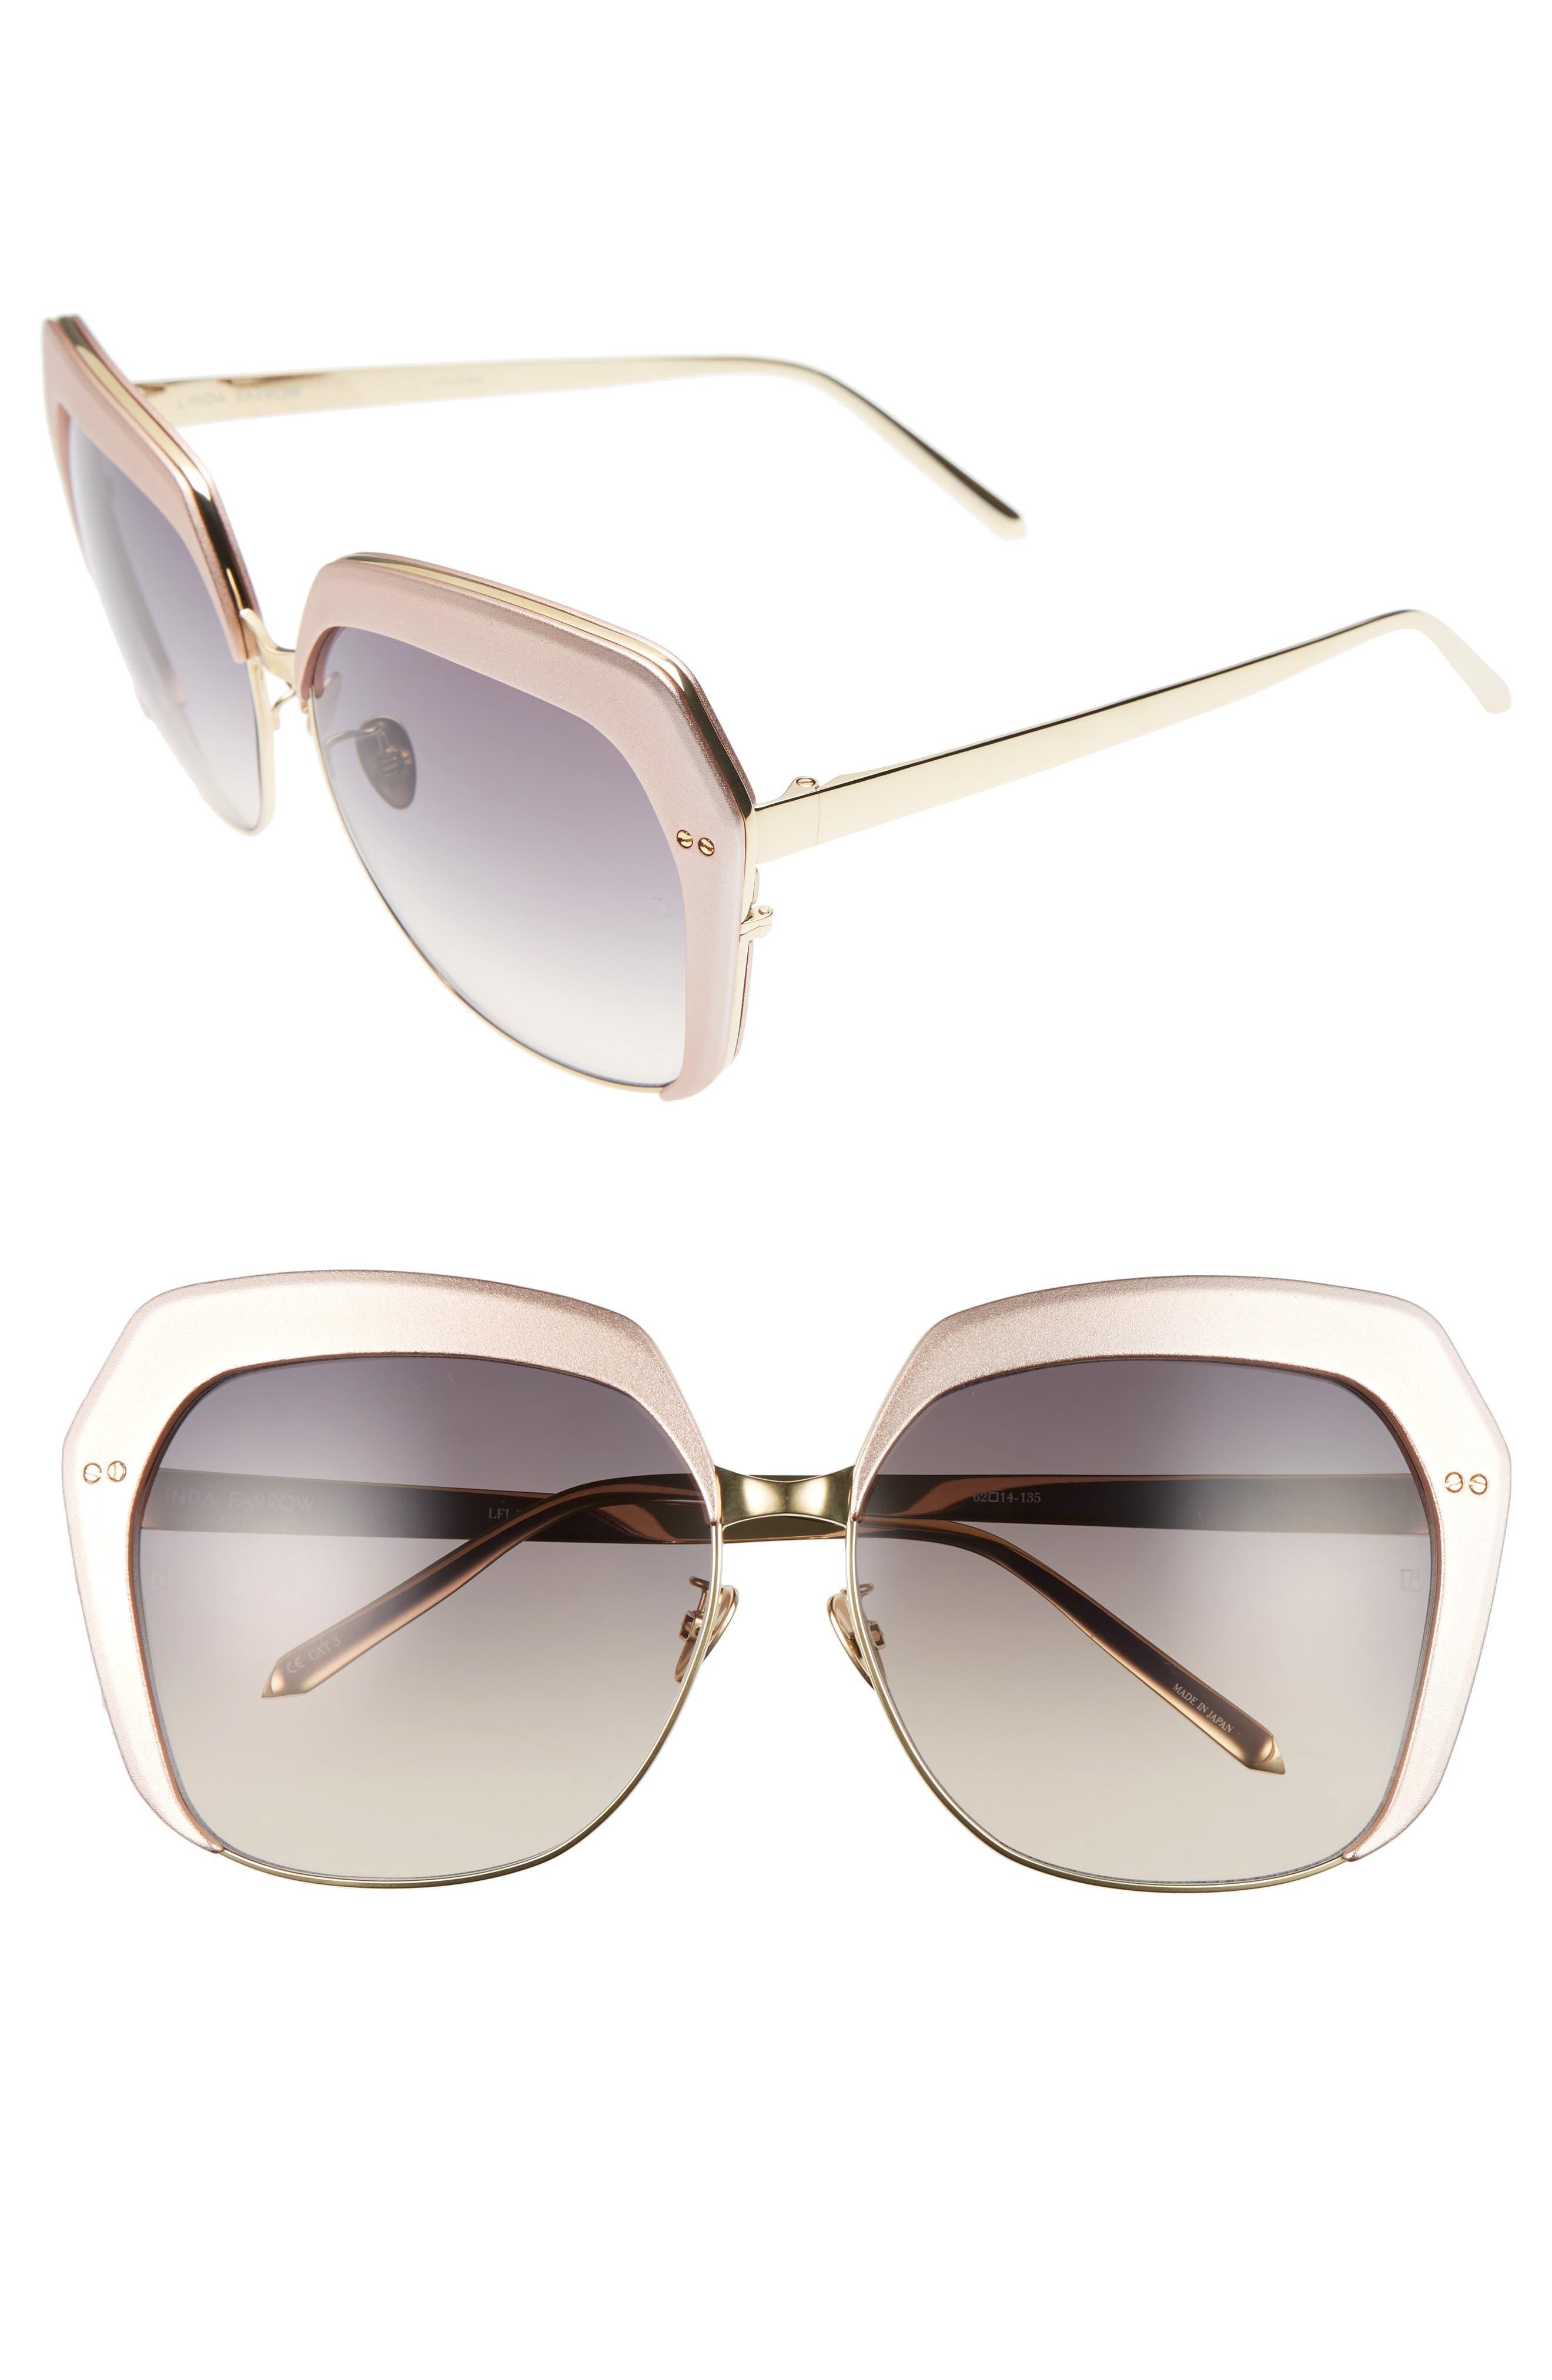 Linda Farrow 62mm 22 Karat Gold Trim Oversize Sunglasses